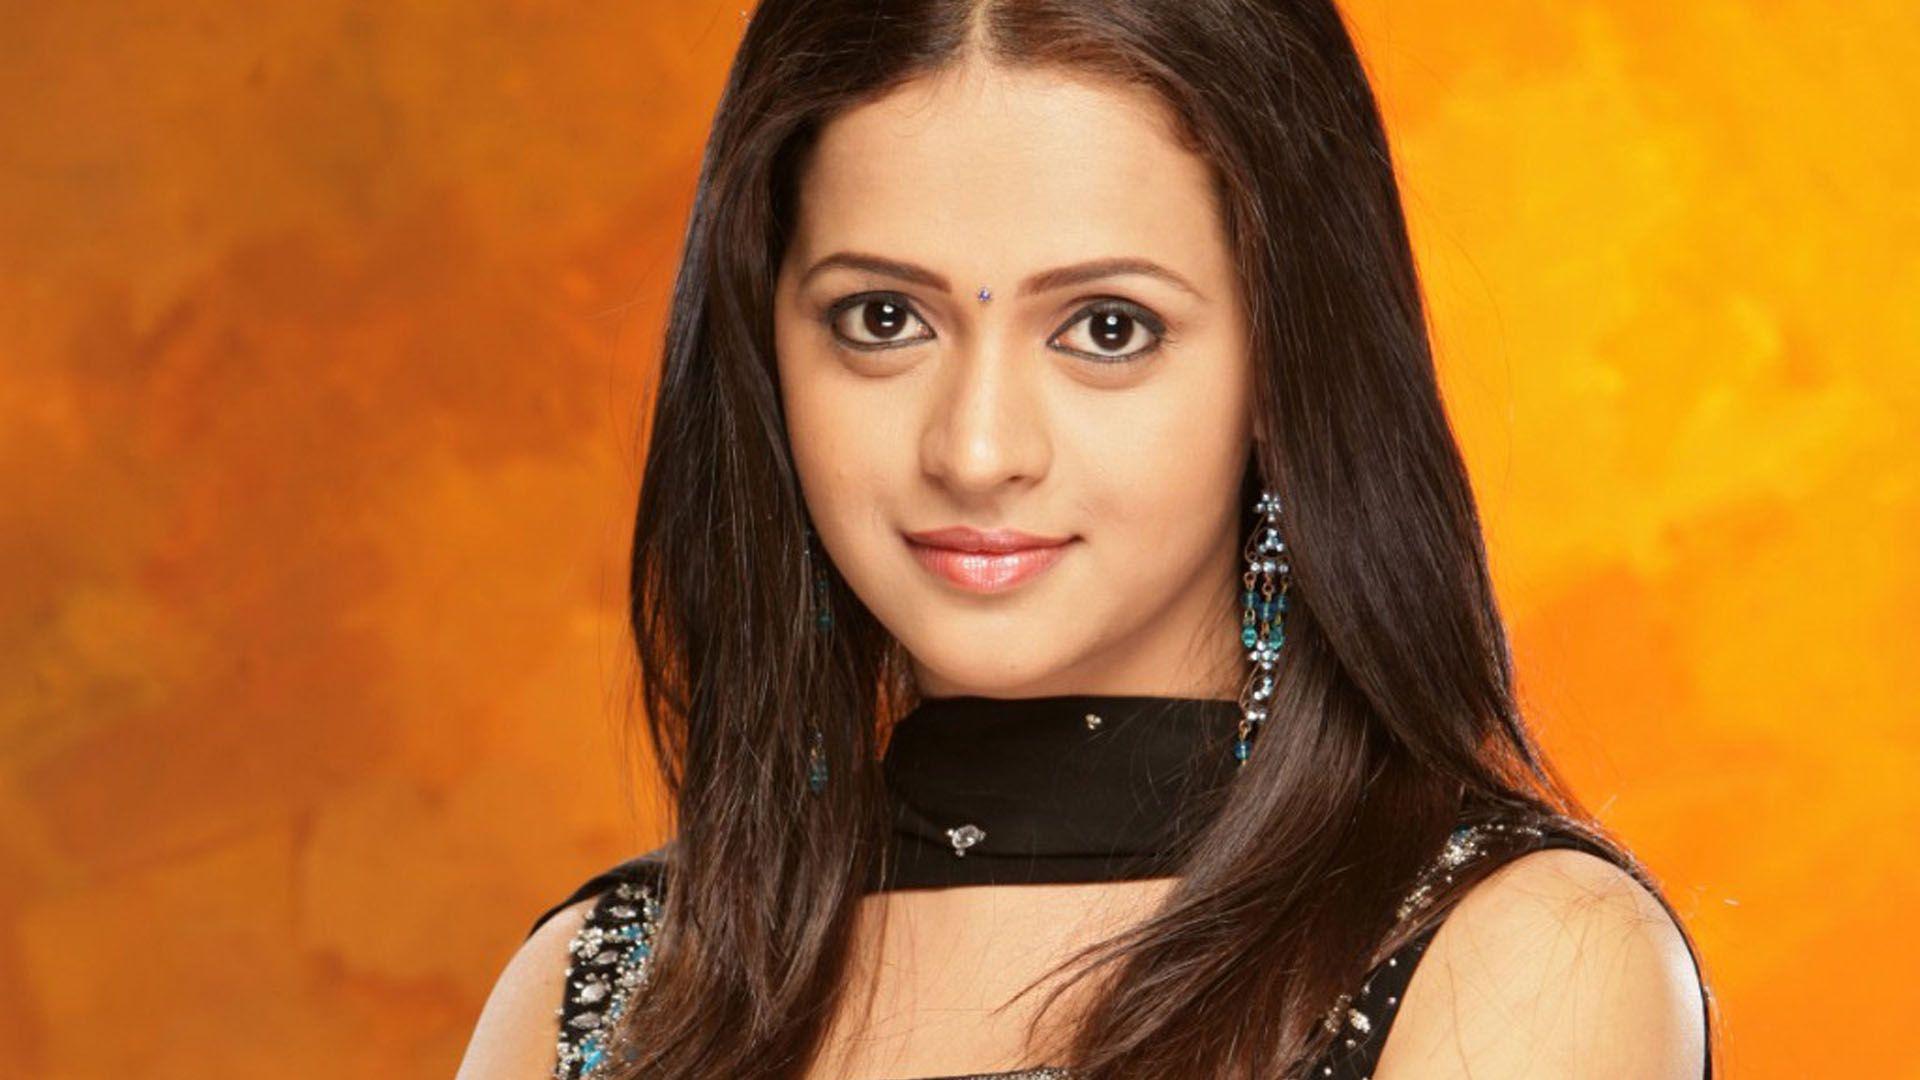 Ajith S Heroine Decides To Enter Wedlock Bhavana Actress Allu Arjun Hairstyle Actresses